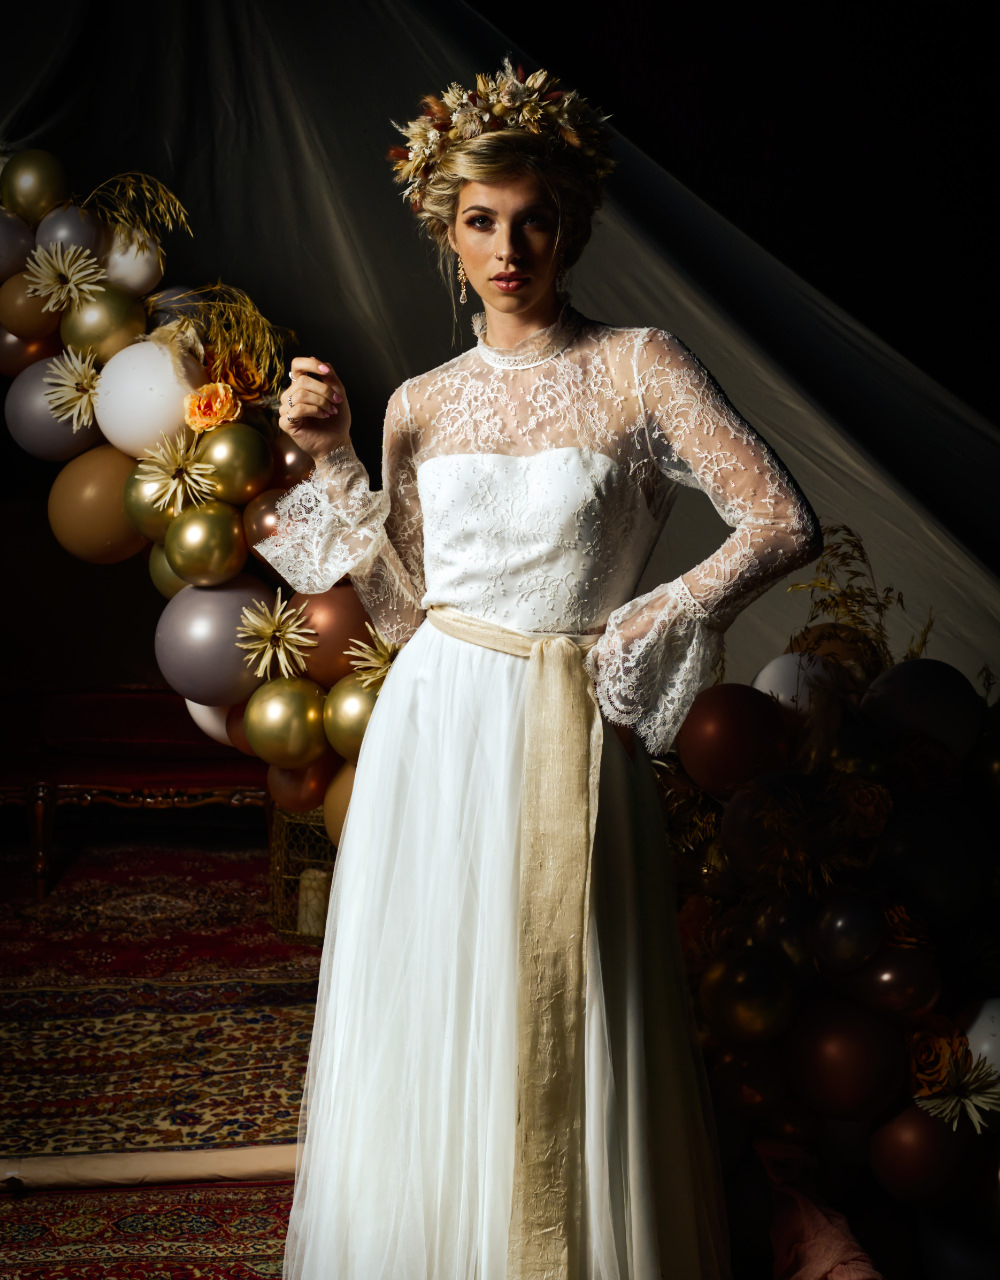 Bride Bridal Dress Gown High Neck Lace Sleeves Lisa Lyons Bridal Moroccan Wedding Inspiration Luke Batchelor Productions